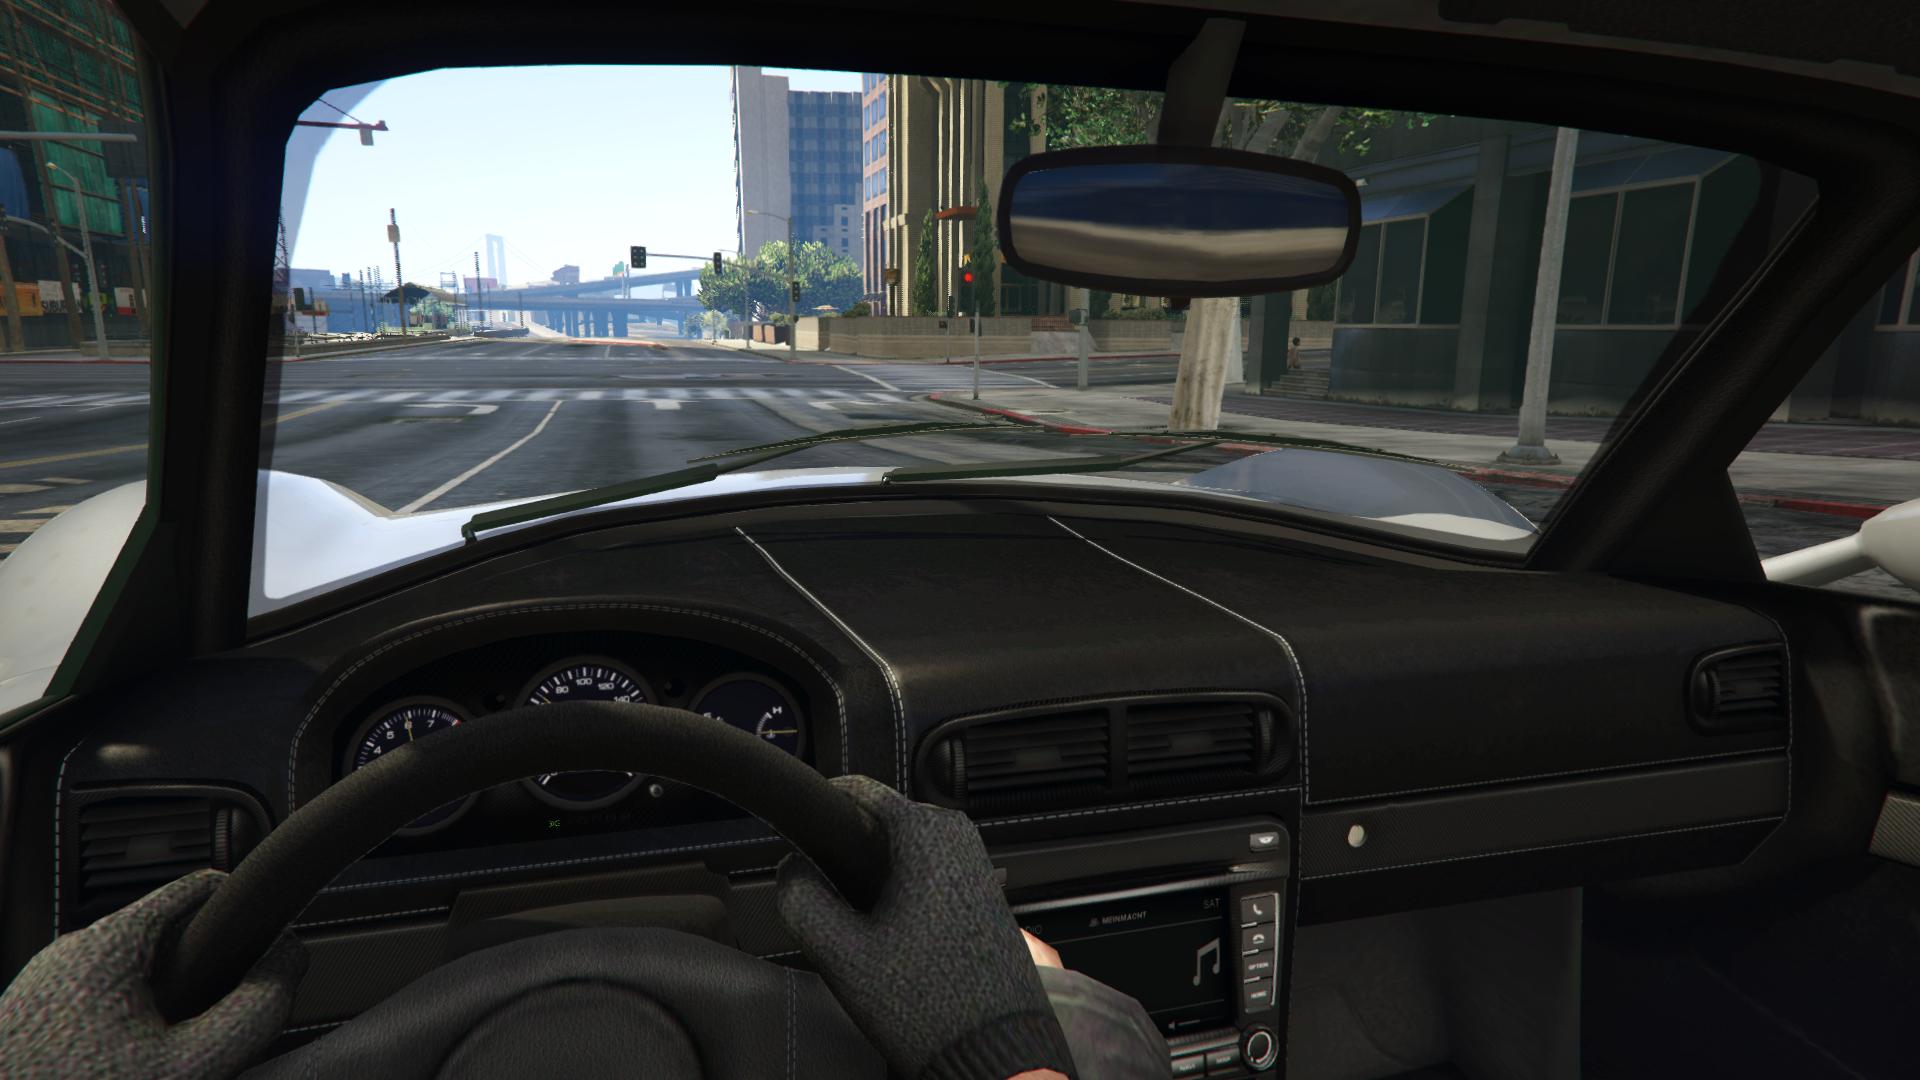 Vehicle Features/Interior Dashboards | GTA Wiki | FANDOM